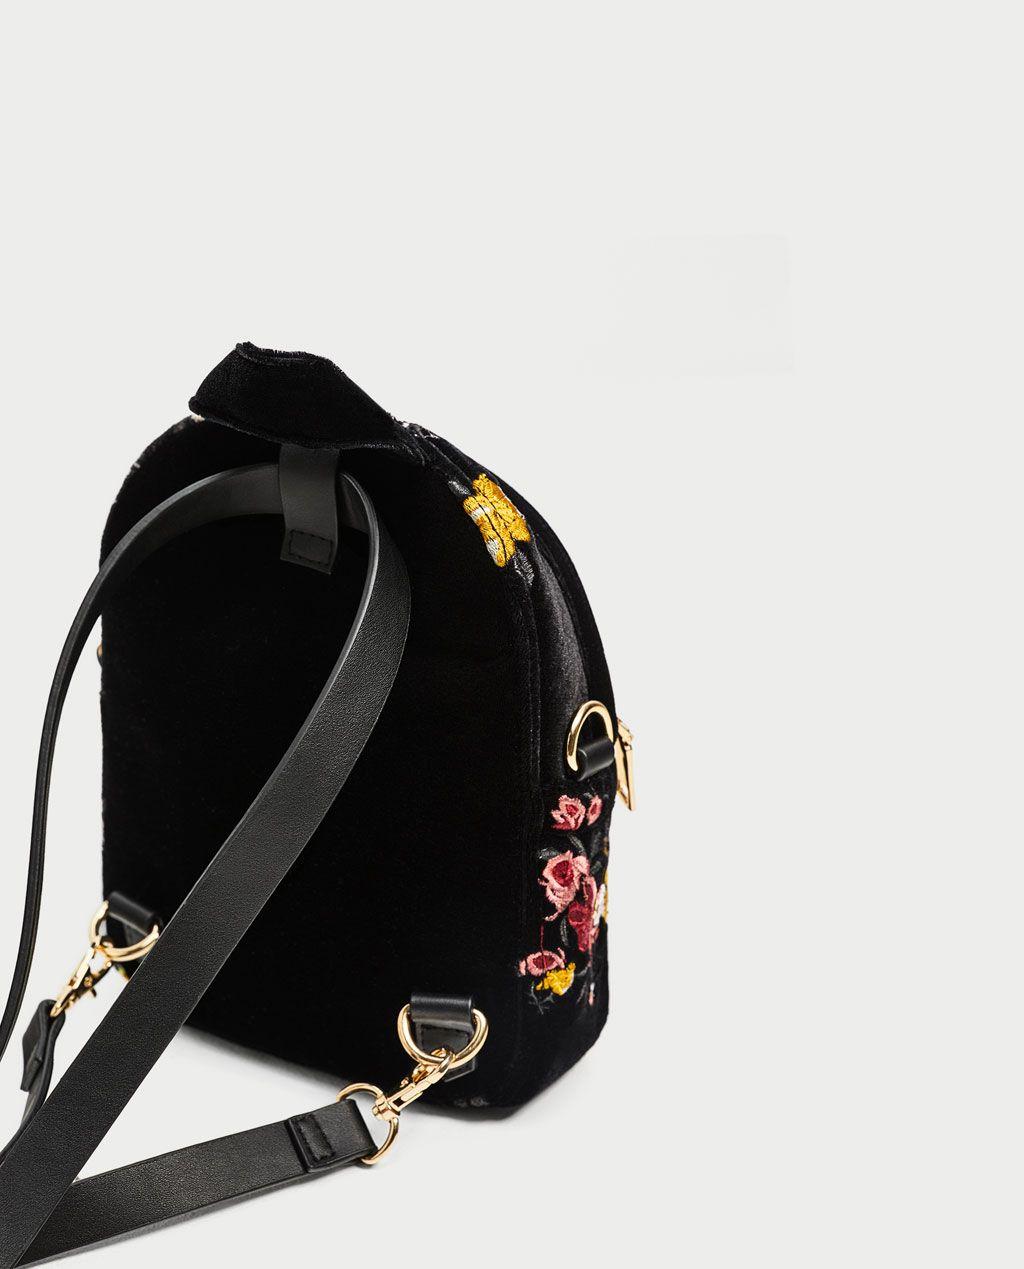 image 4 de mini sac dos en velours brod de zara sac. Black Bedroom Furniture Sets. Home Design Ideas